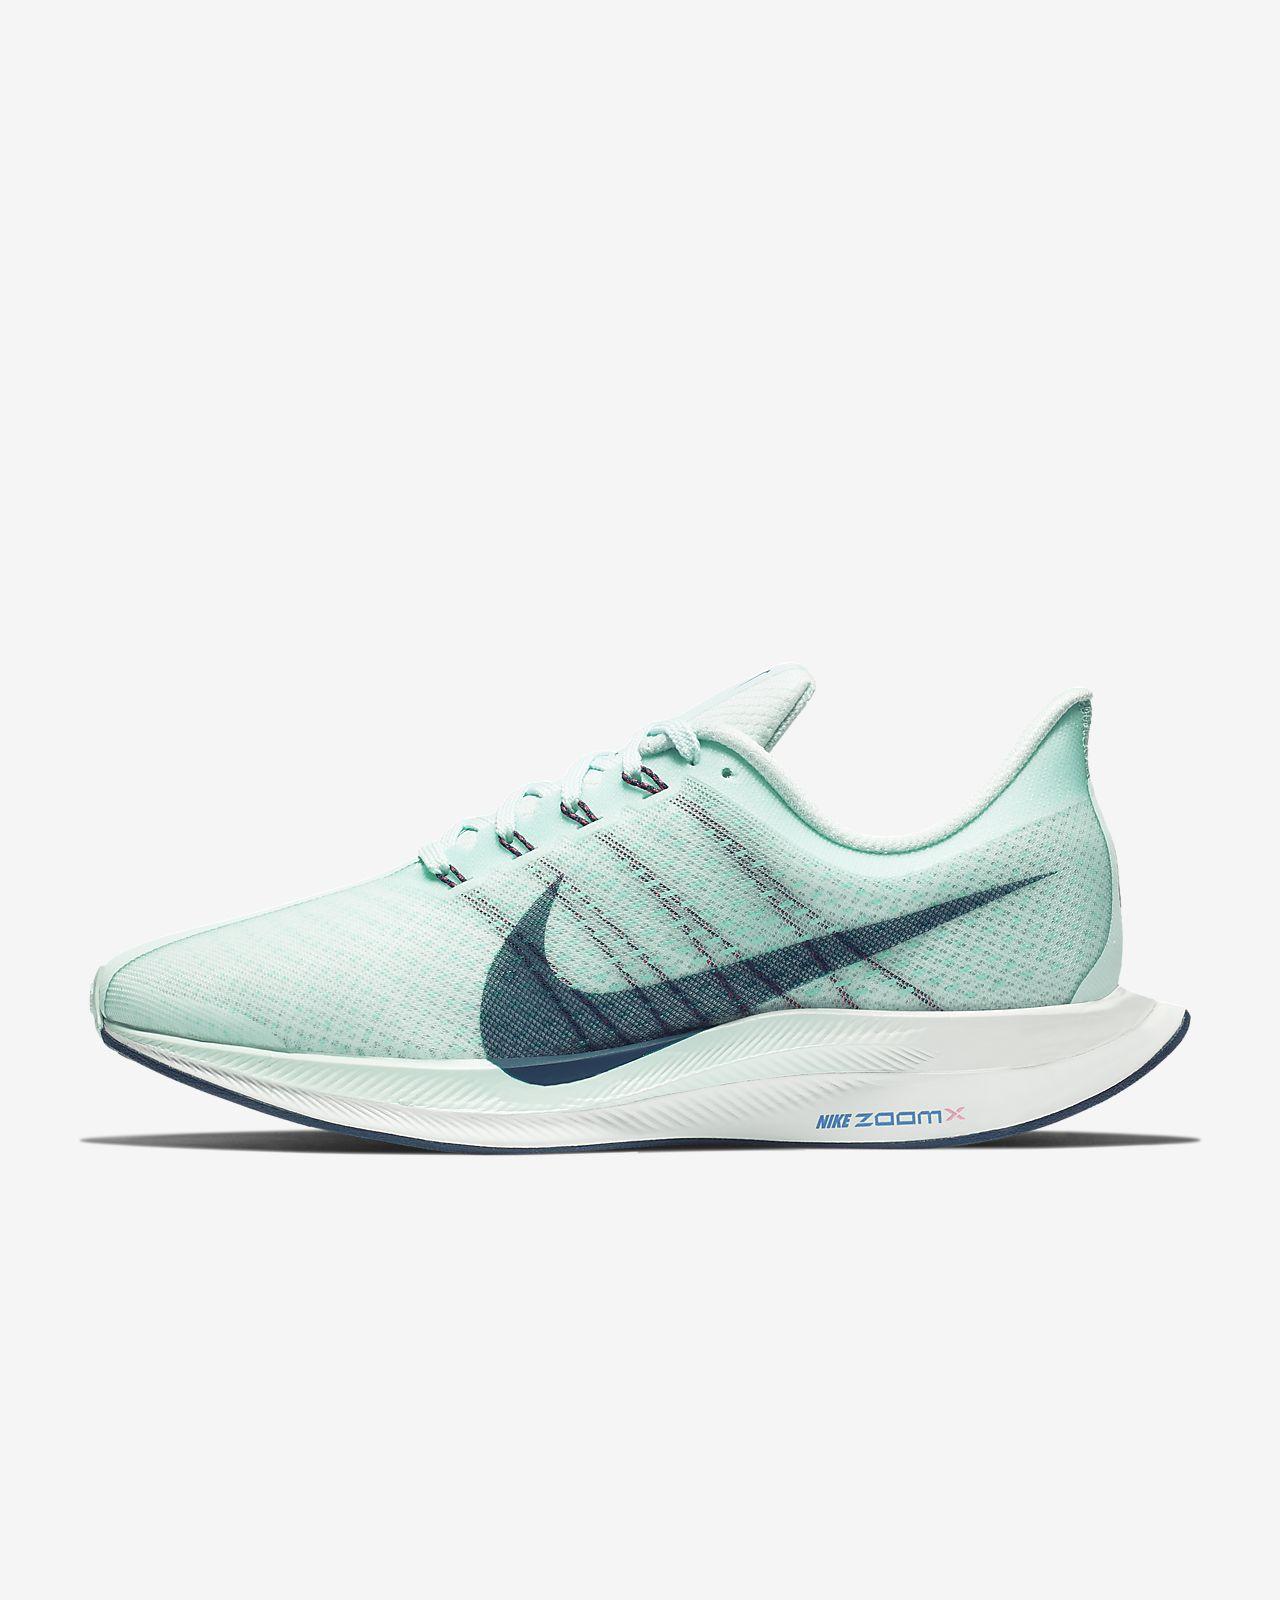 Chaussure de running Nike Zoom Pegasus Turbo pour Femme